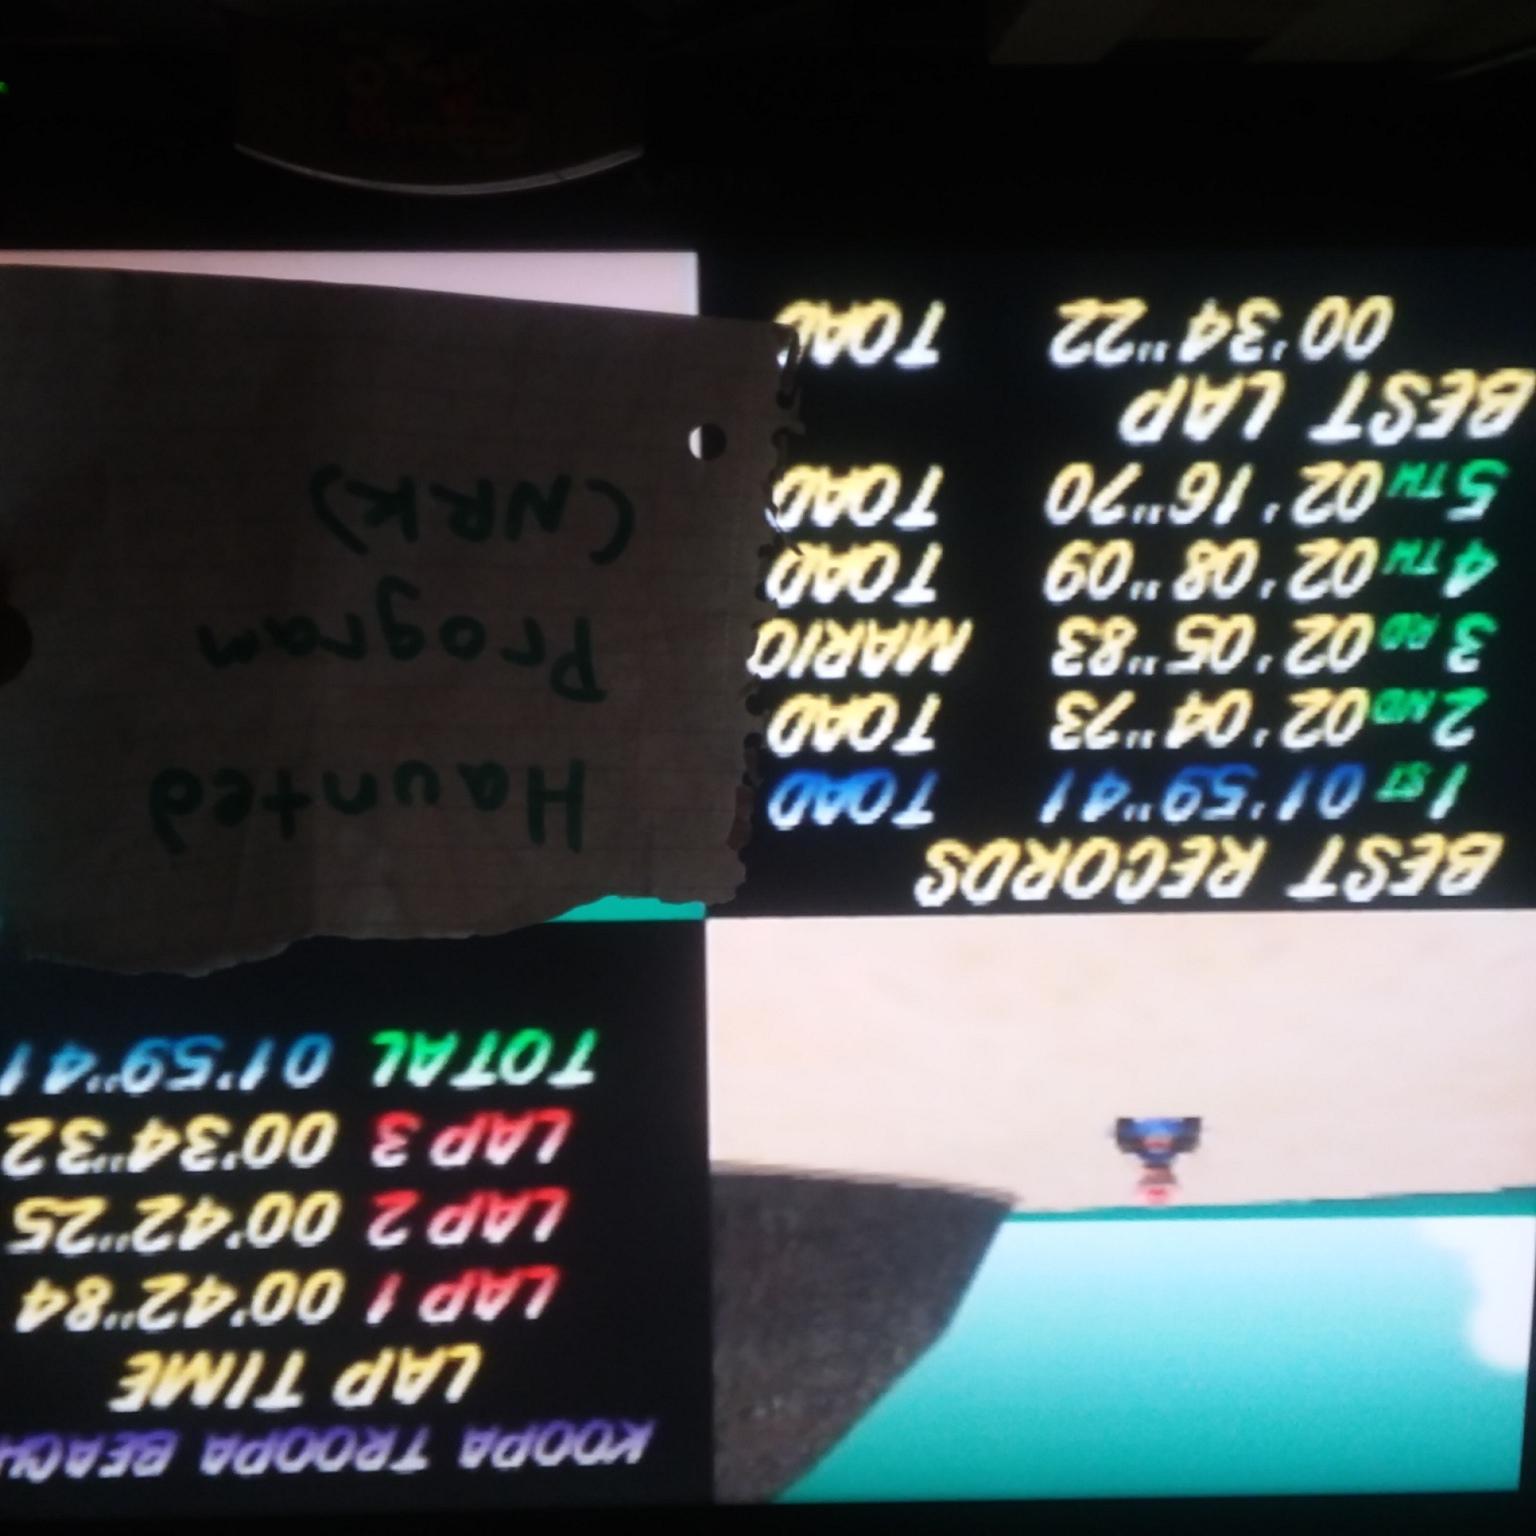 Mario Kart 64: Koopa Troopa Beach [Time Trial] time of 0:01:59.41